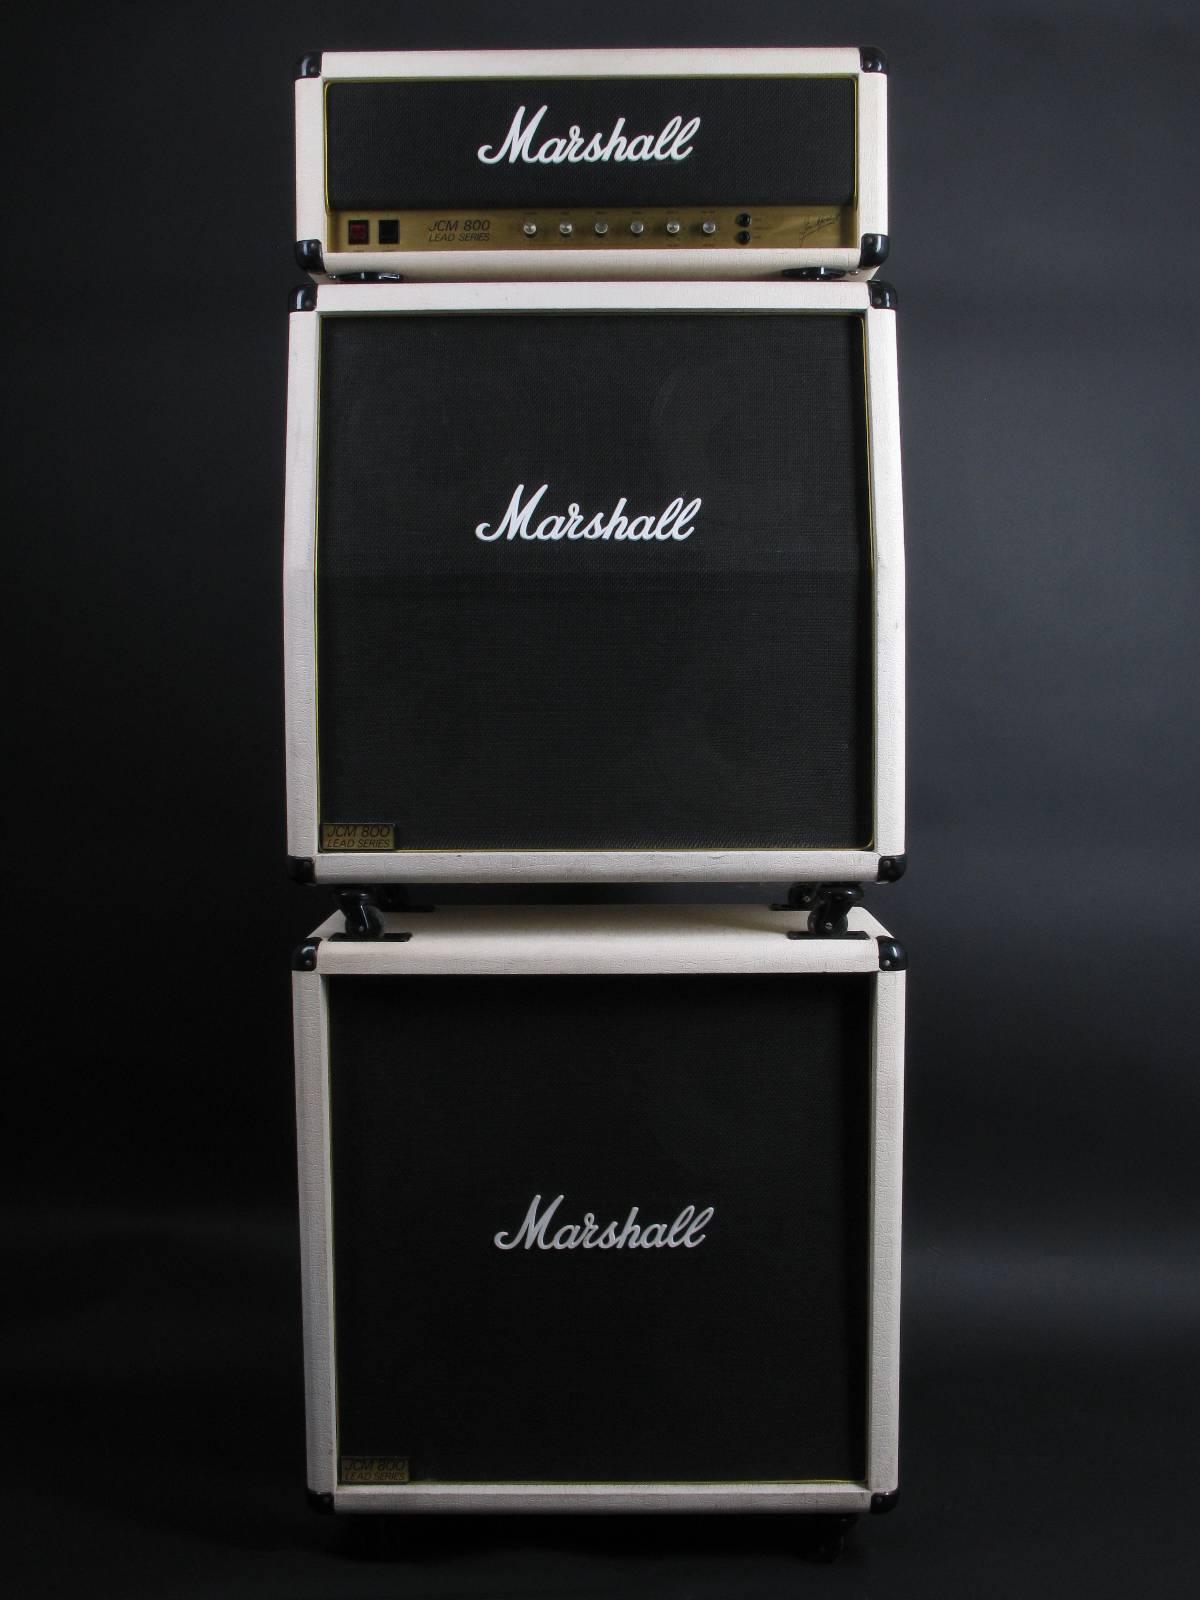 1983 Marshall JCM800 MK2 Superlead 100W - White Ltd.